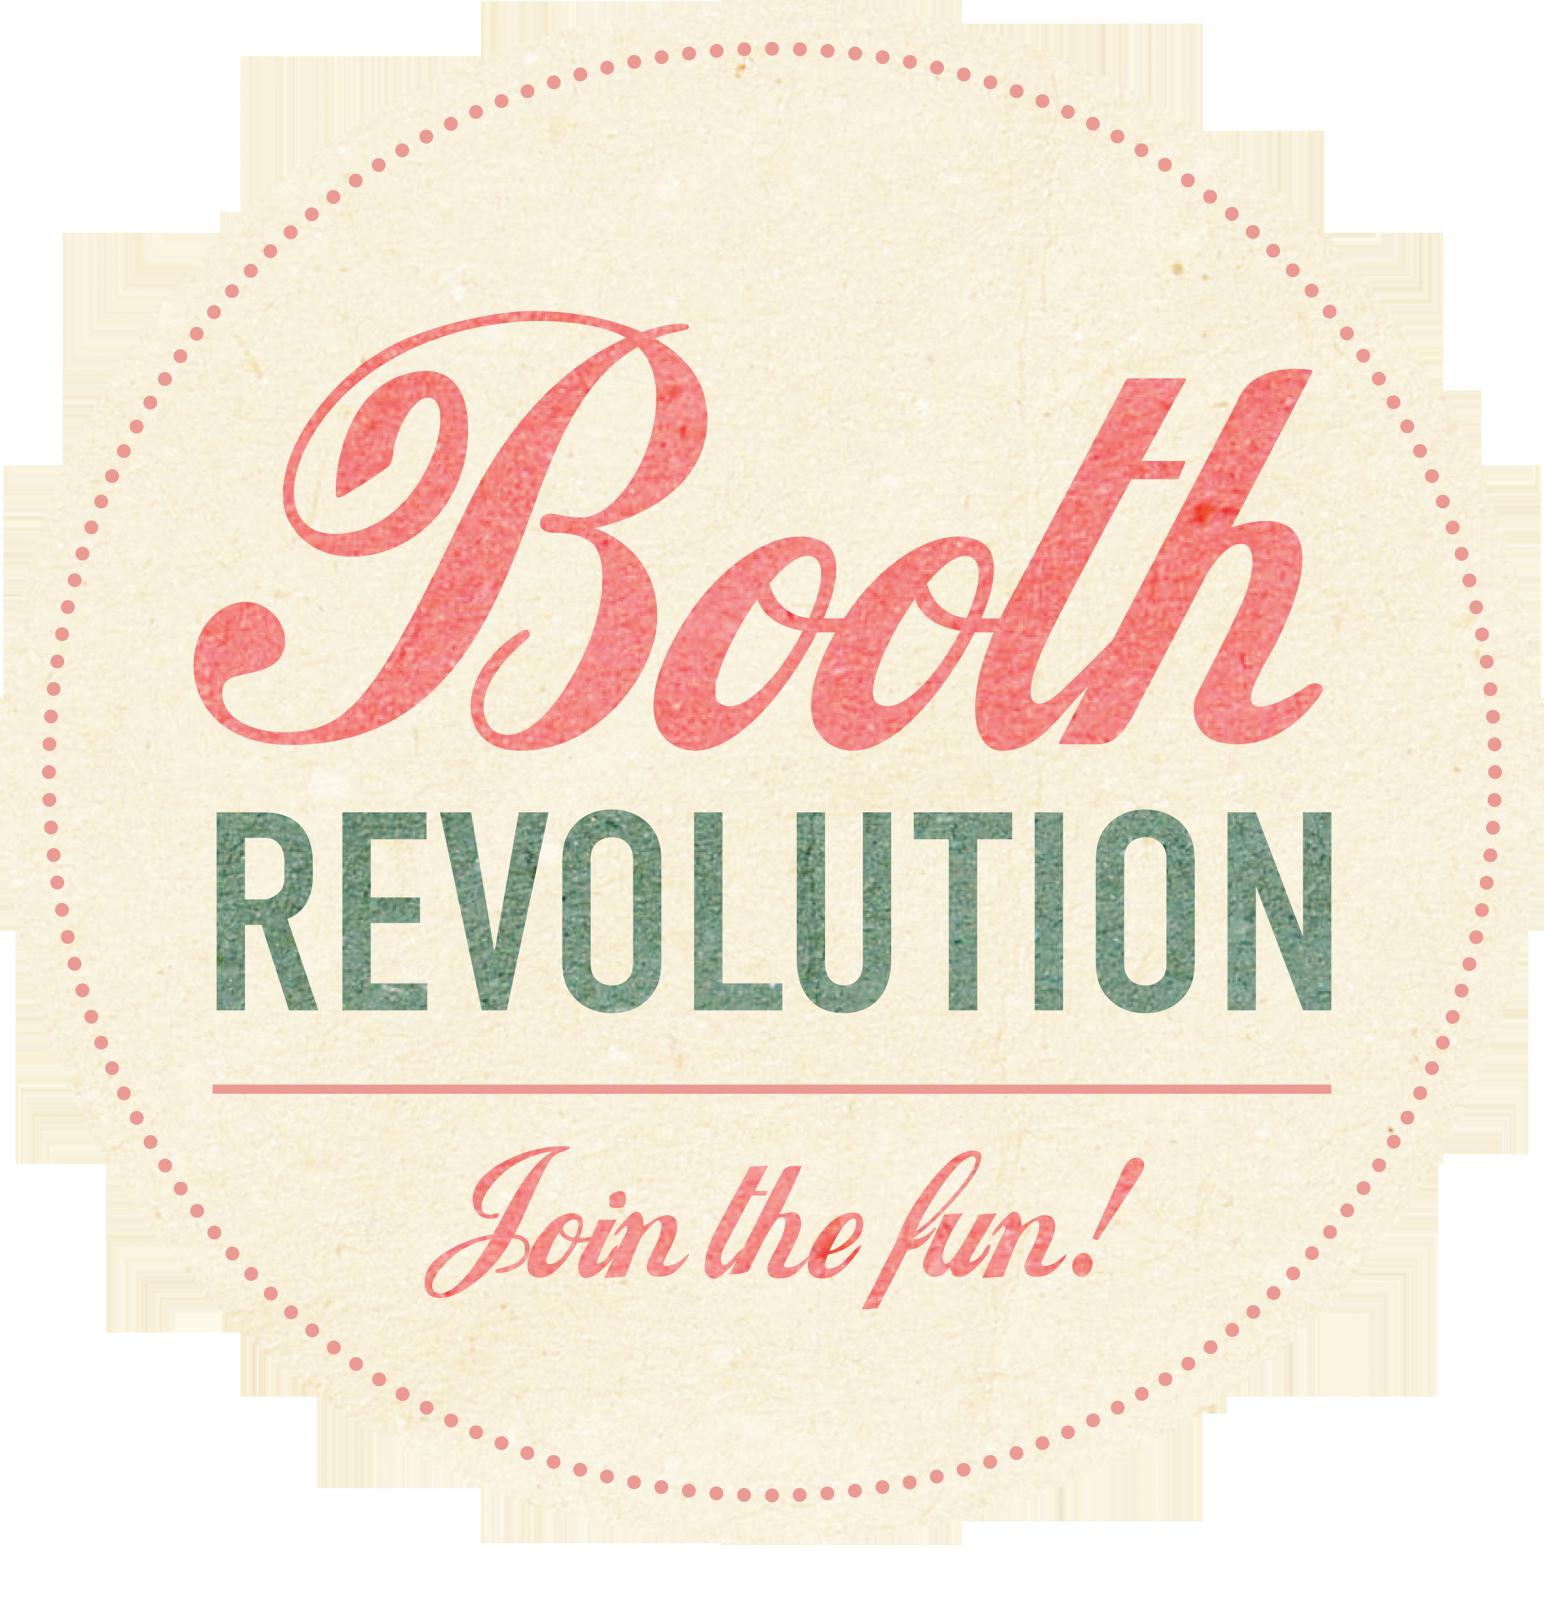 Booth Revolution Italia